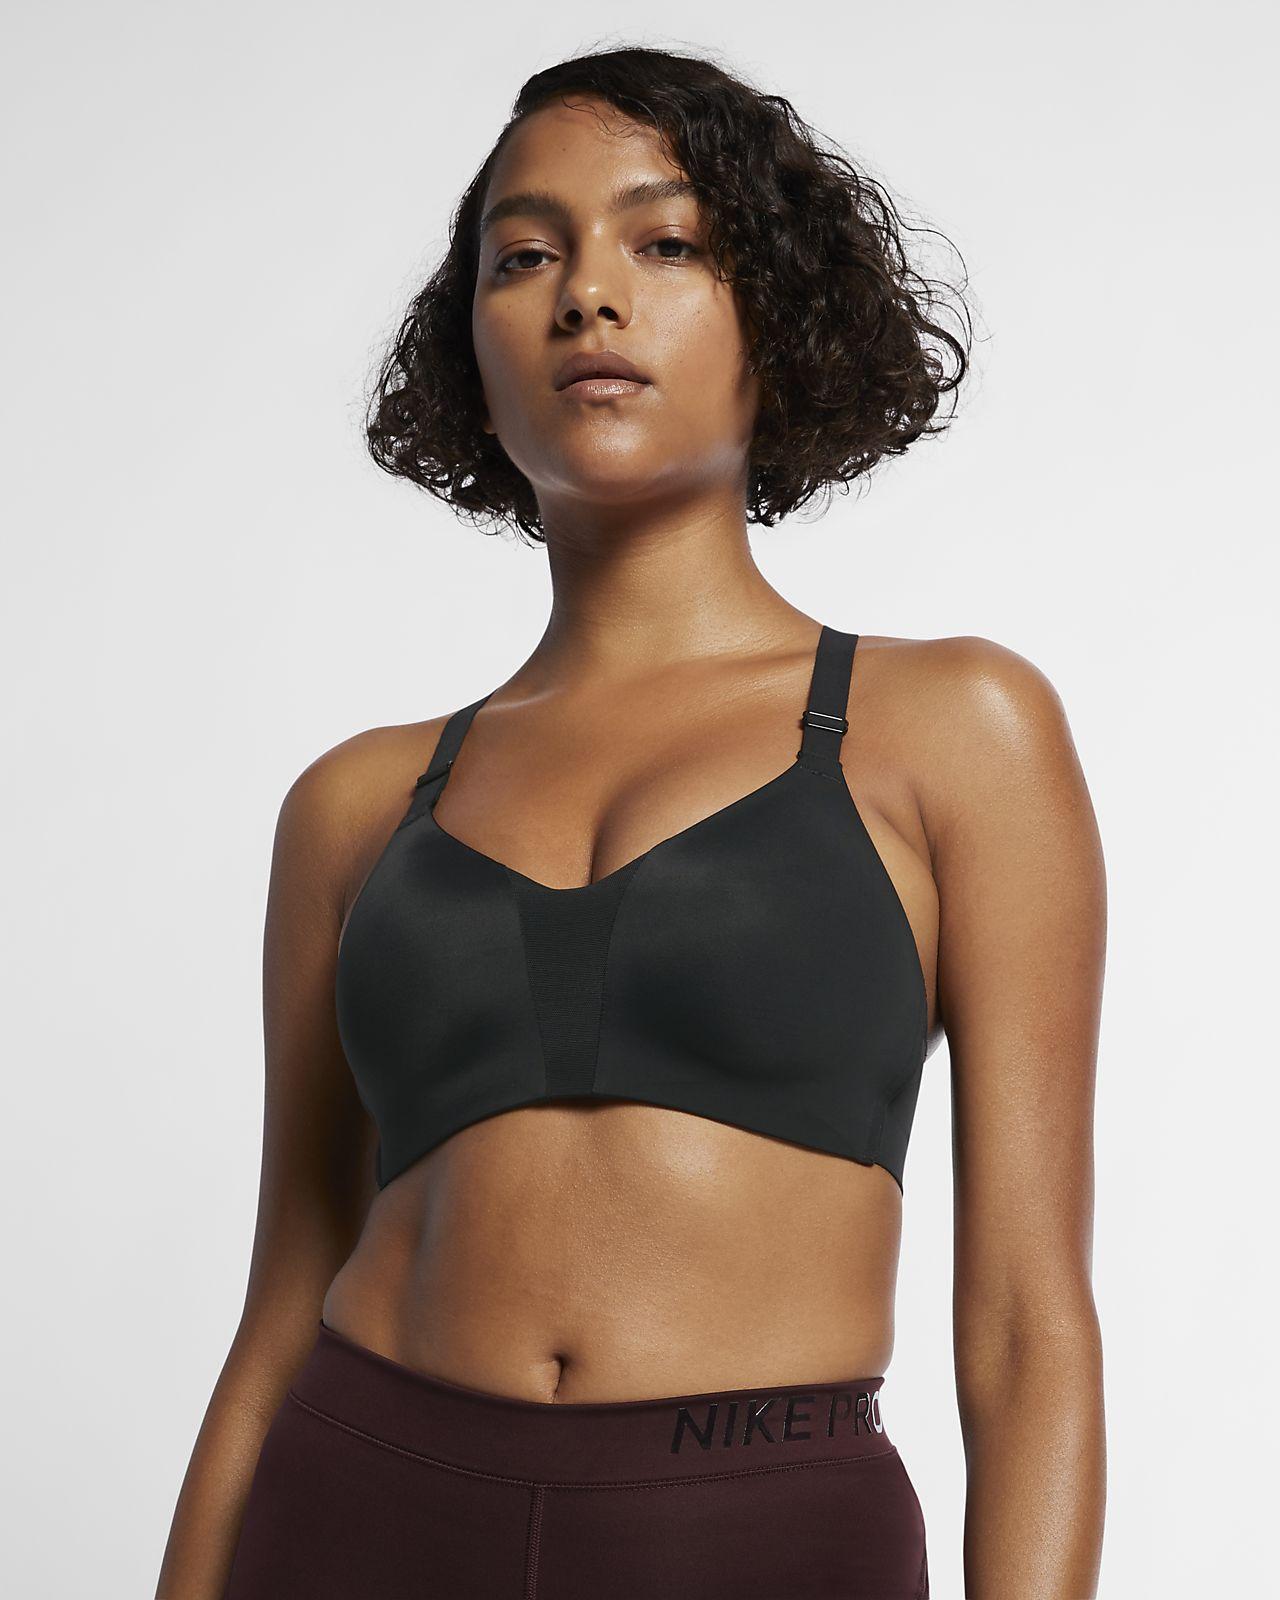 Nike Rival 女子高强度支撑运动内衣